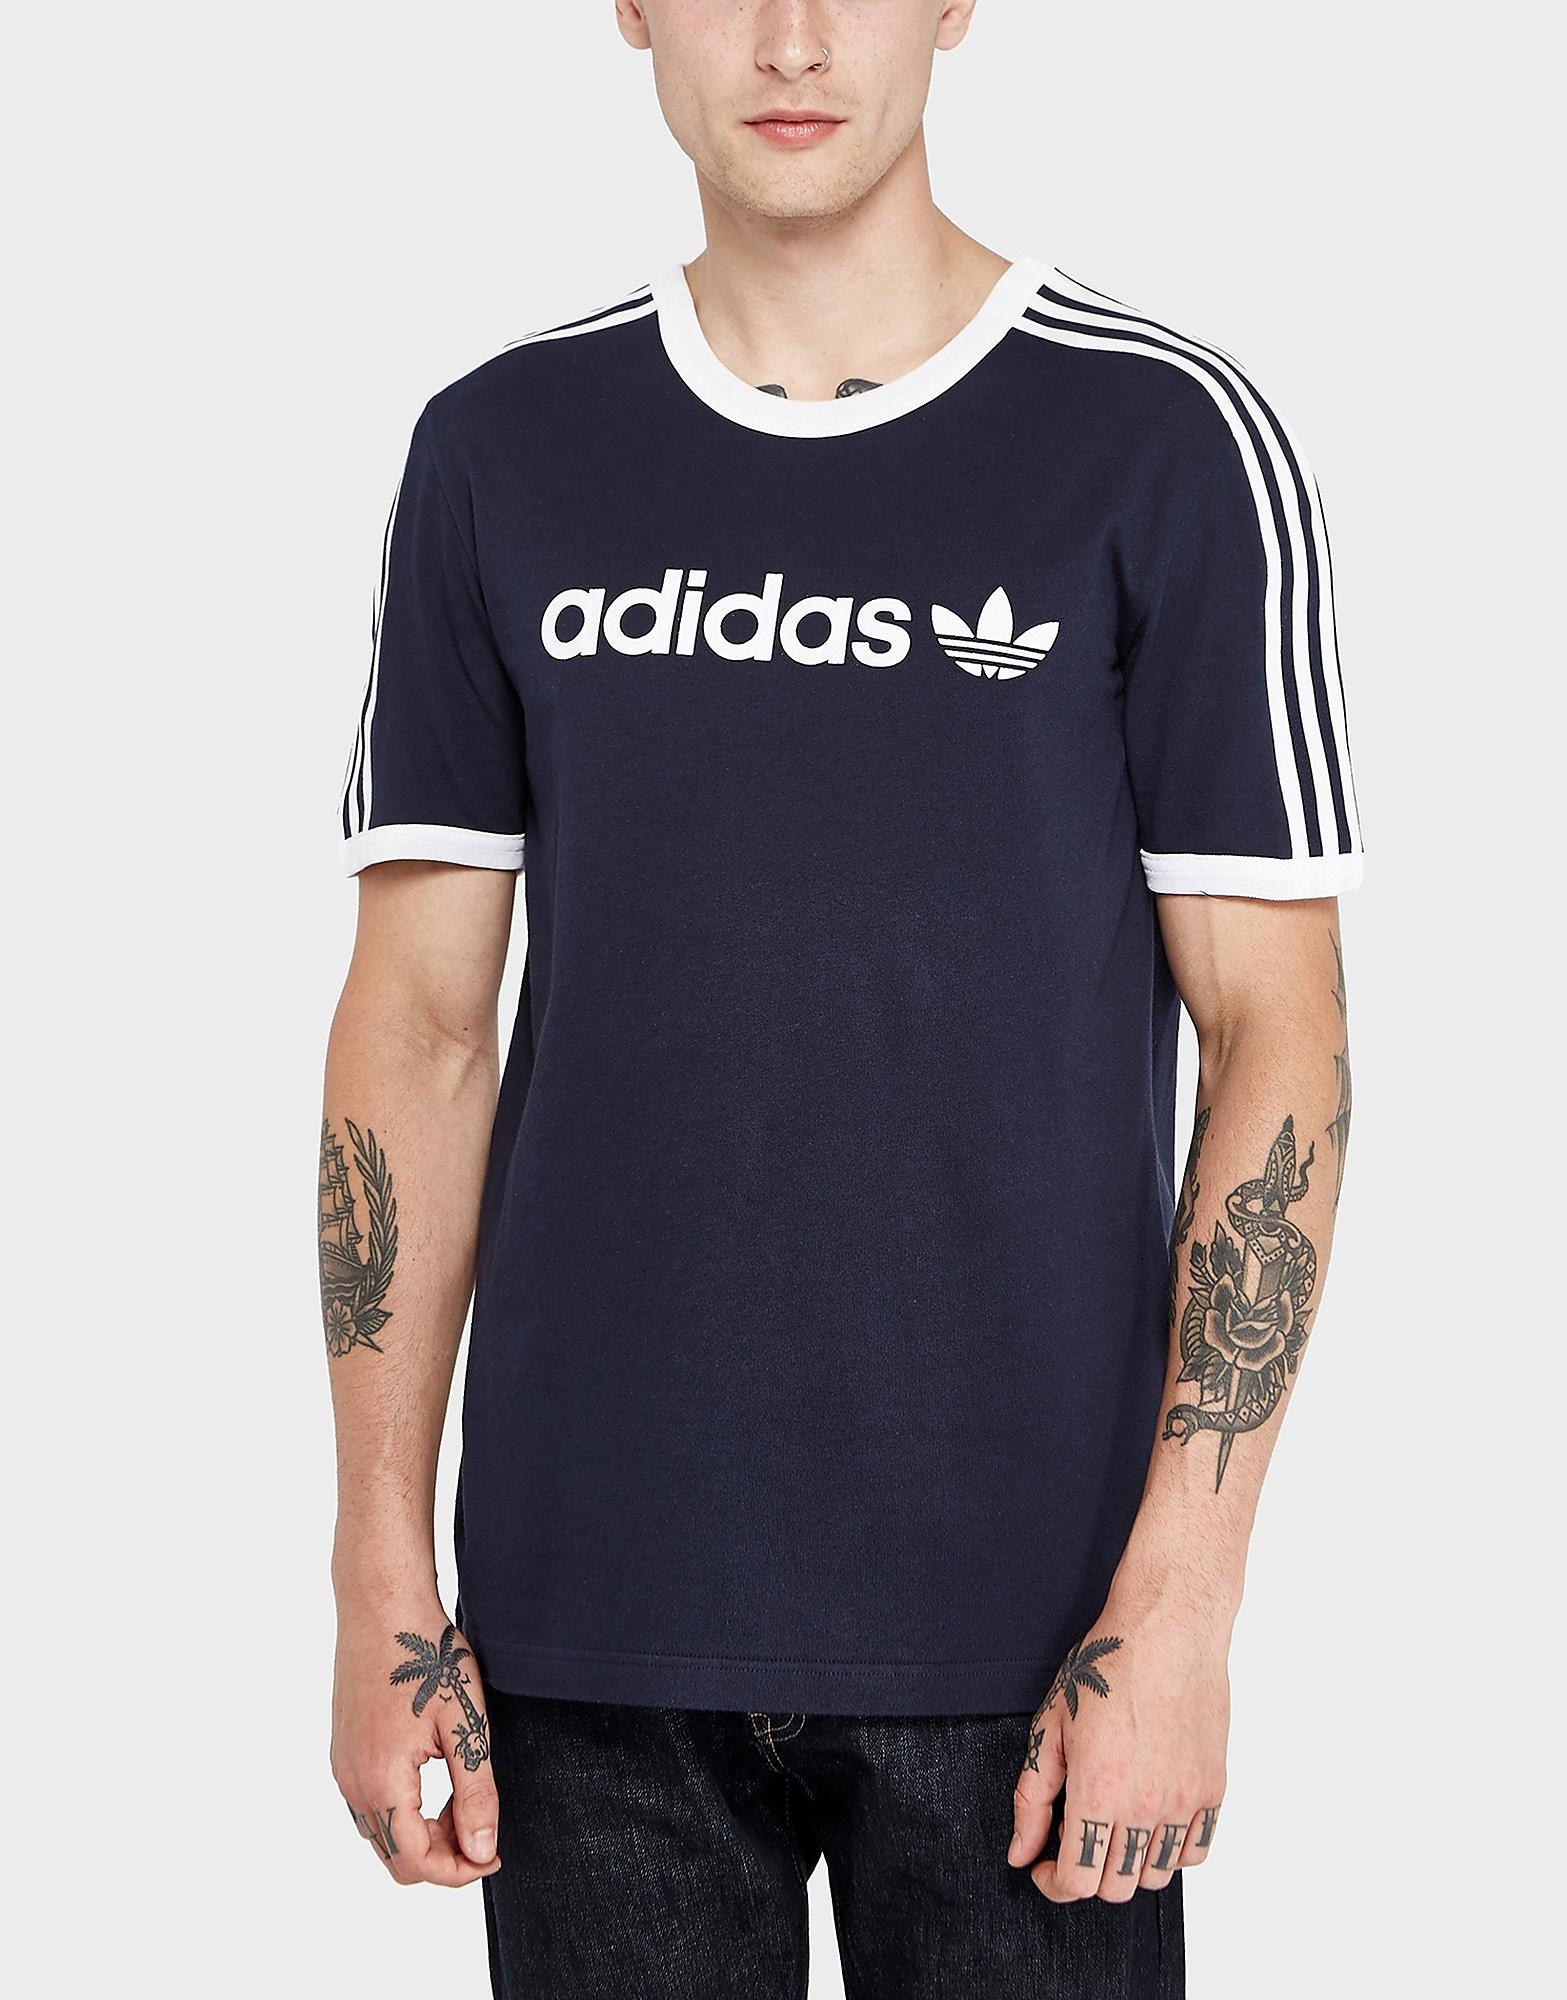 adidas Originals Linear Short Sleeve T-Shirt